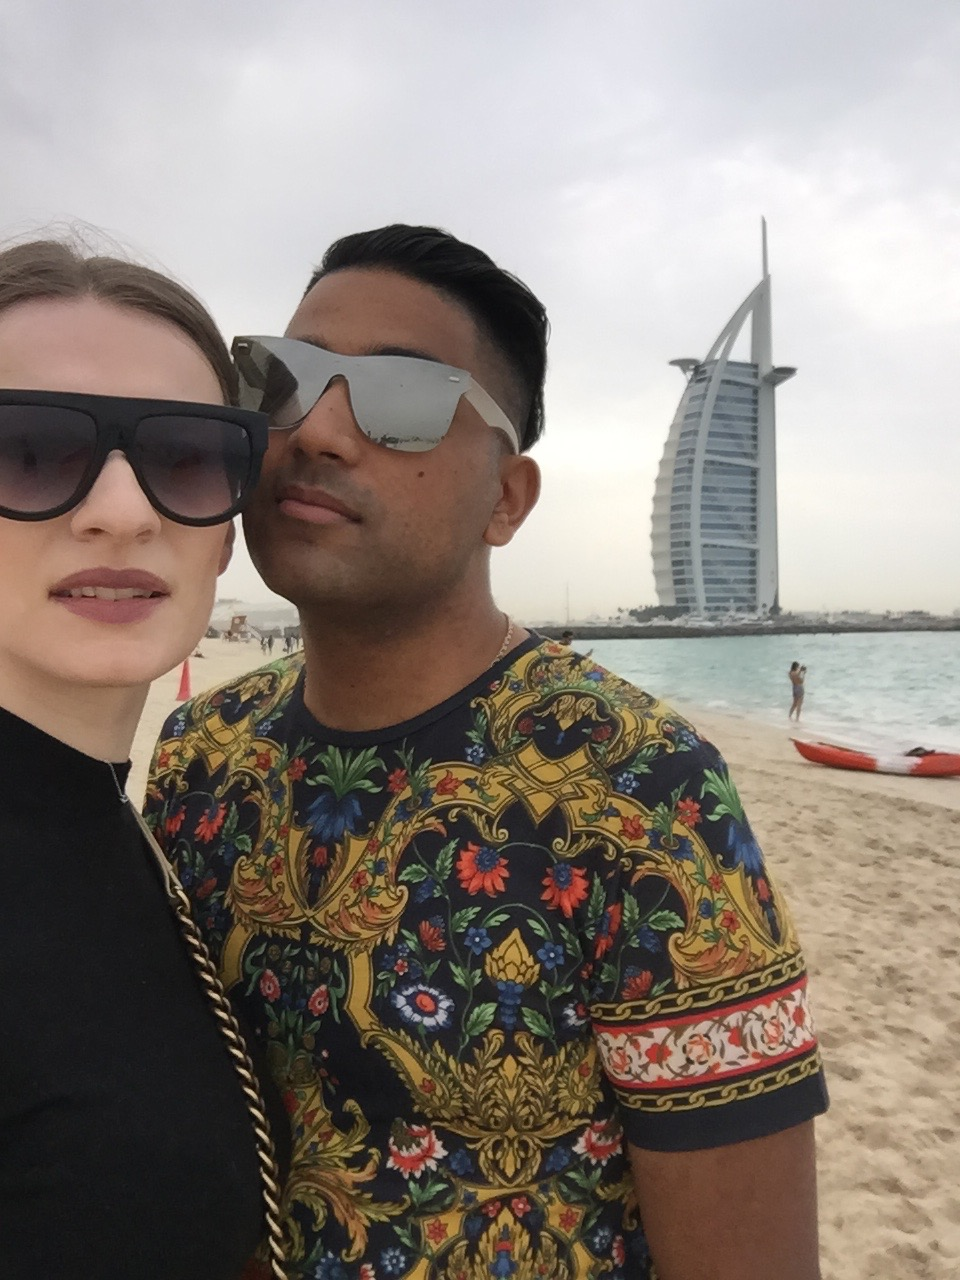 MON MODE | Fashion Blogger | Travel Blogger| Dubai | UAE | Best of 2017 Travel